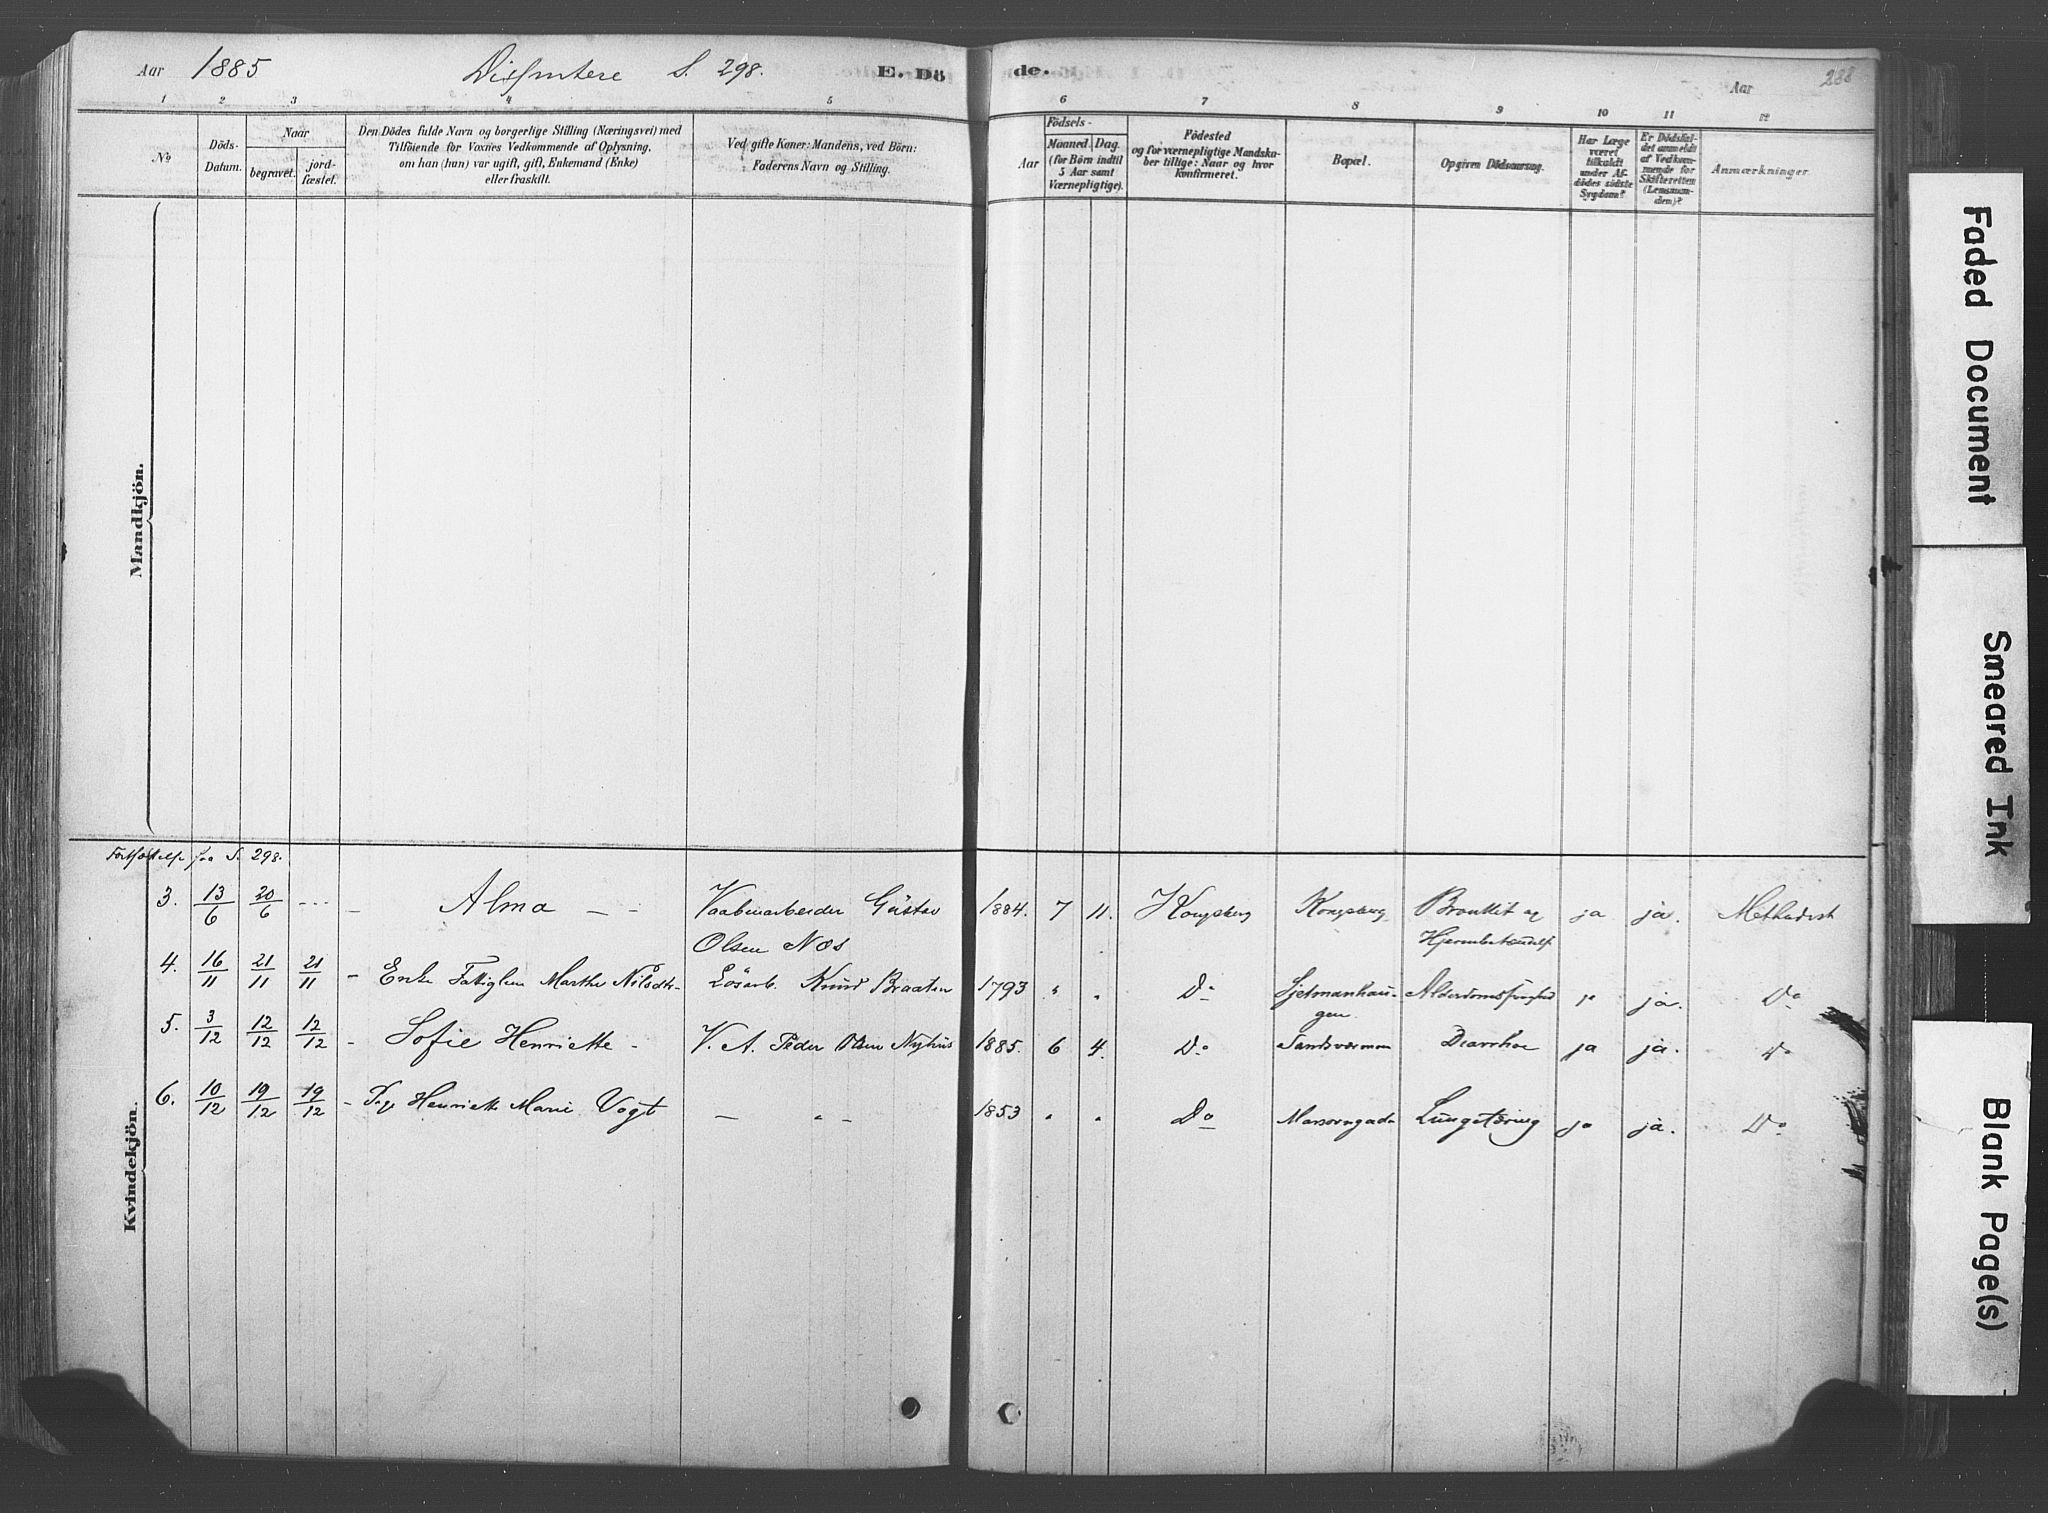 SAKO, Kongsberg kirkebøker, F/Fb/L0001: Ministerialbok nr. II 1, 1878-1886, s. 288